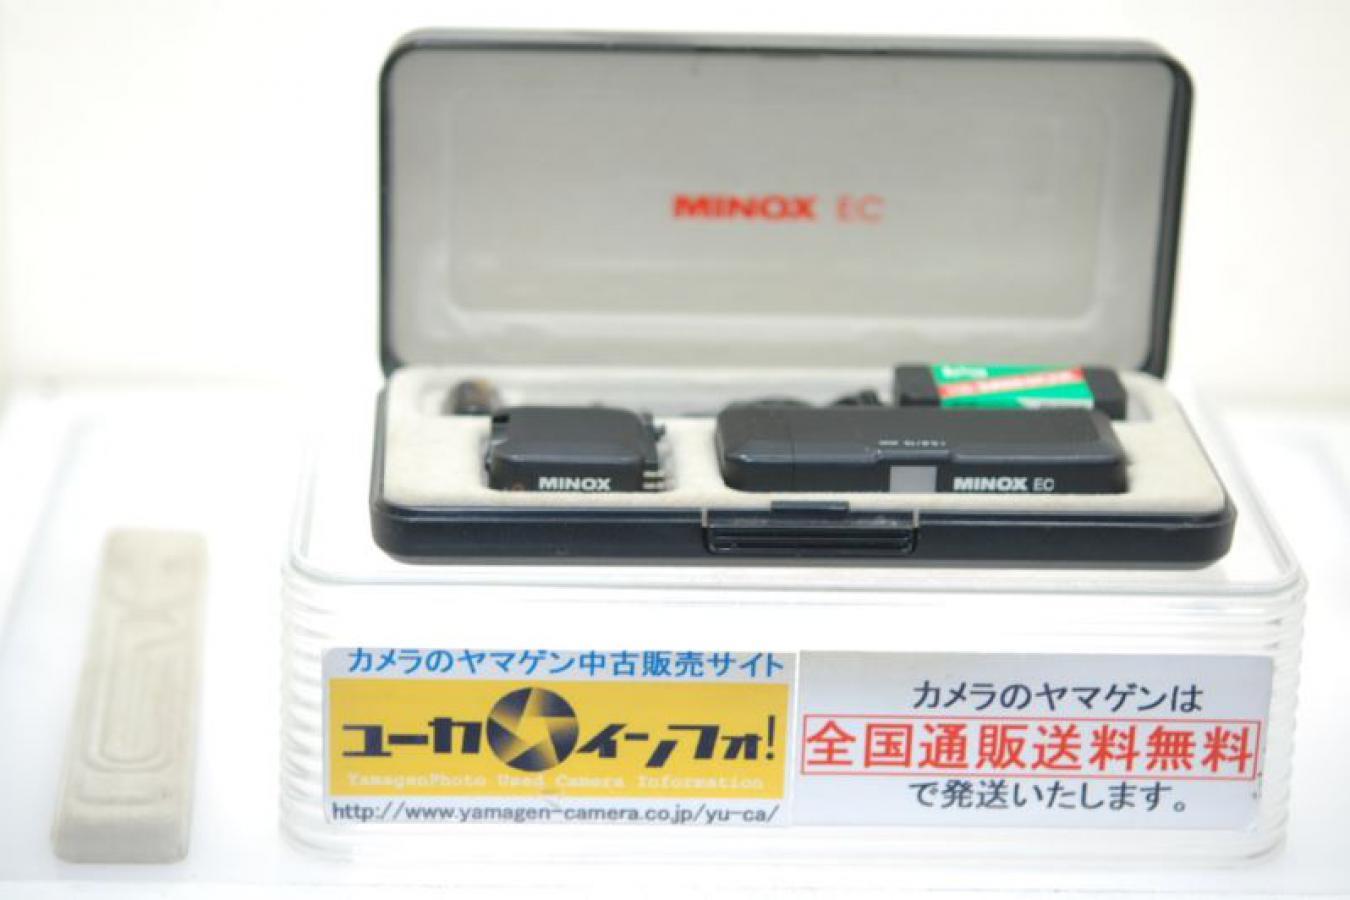 MINOX EC 【テストフィルム、バッテリー、ストラップ、化粧箱付】